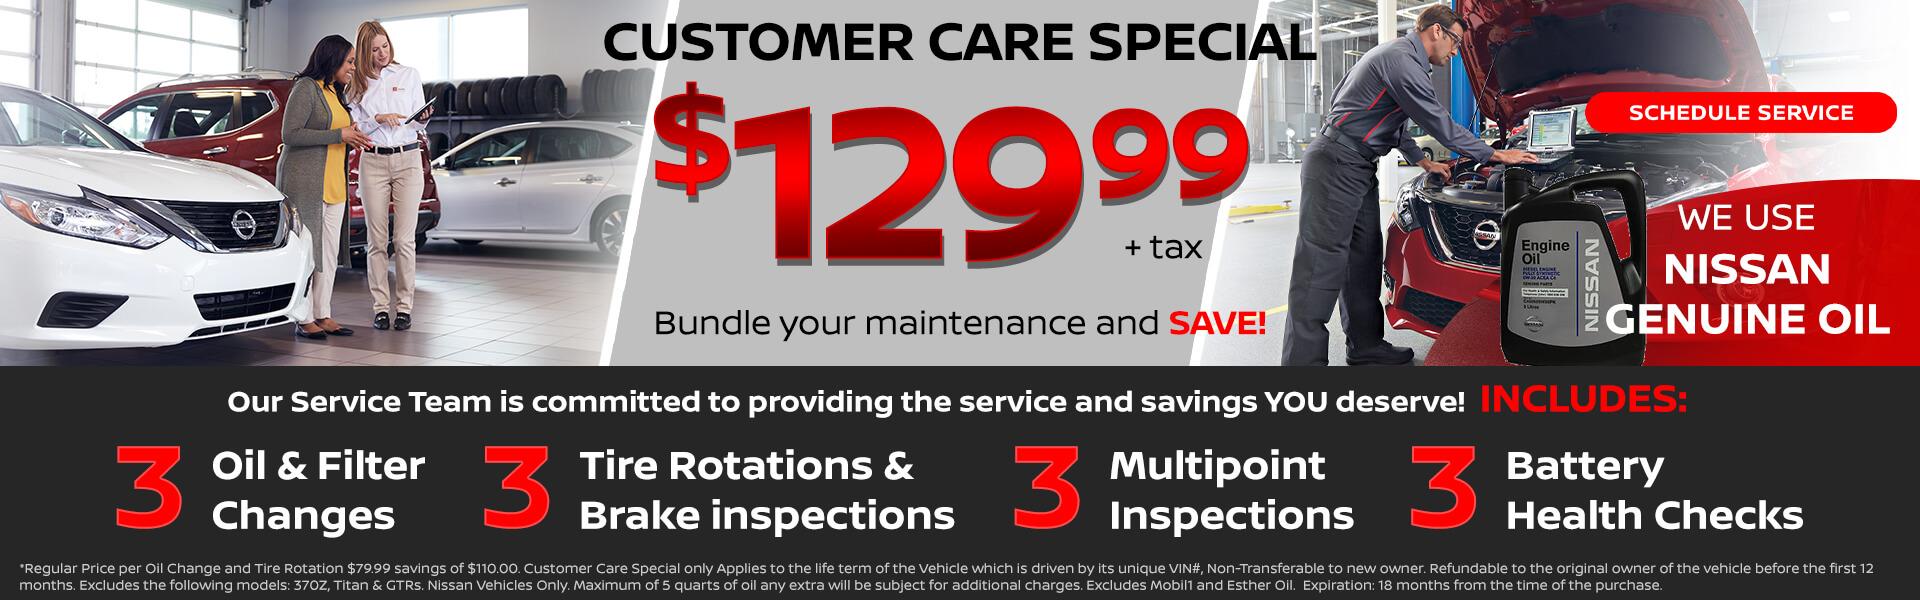 Customer Care Service Special